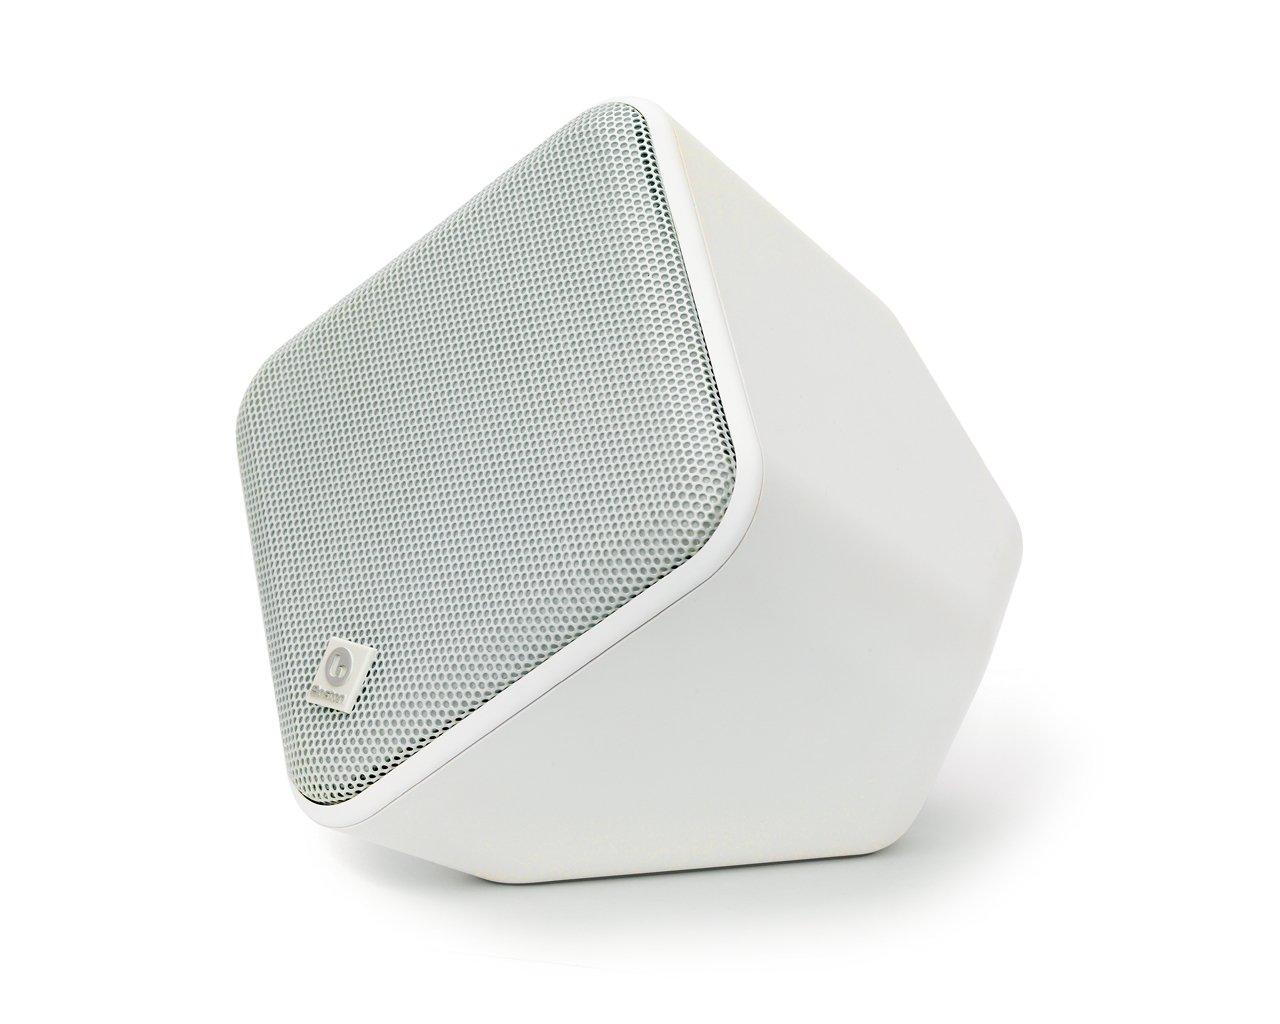 Boston Acoustic SoundWare XS Ultra-Compact Satellite Speaker (White) by Boston Acoustics